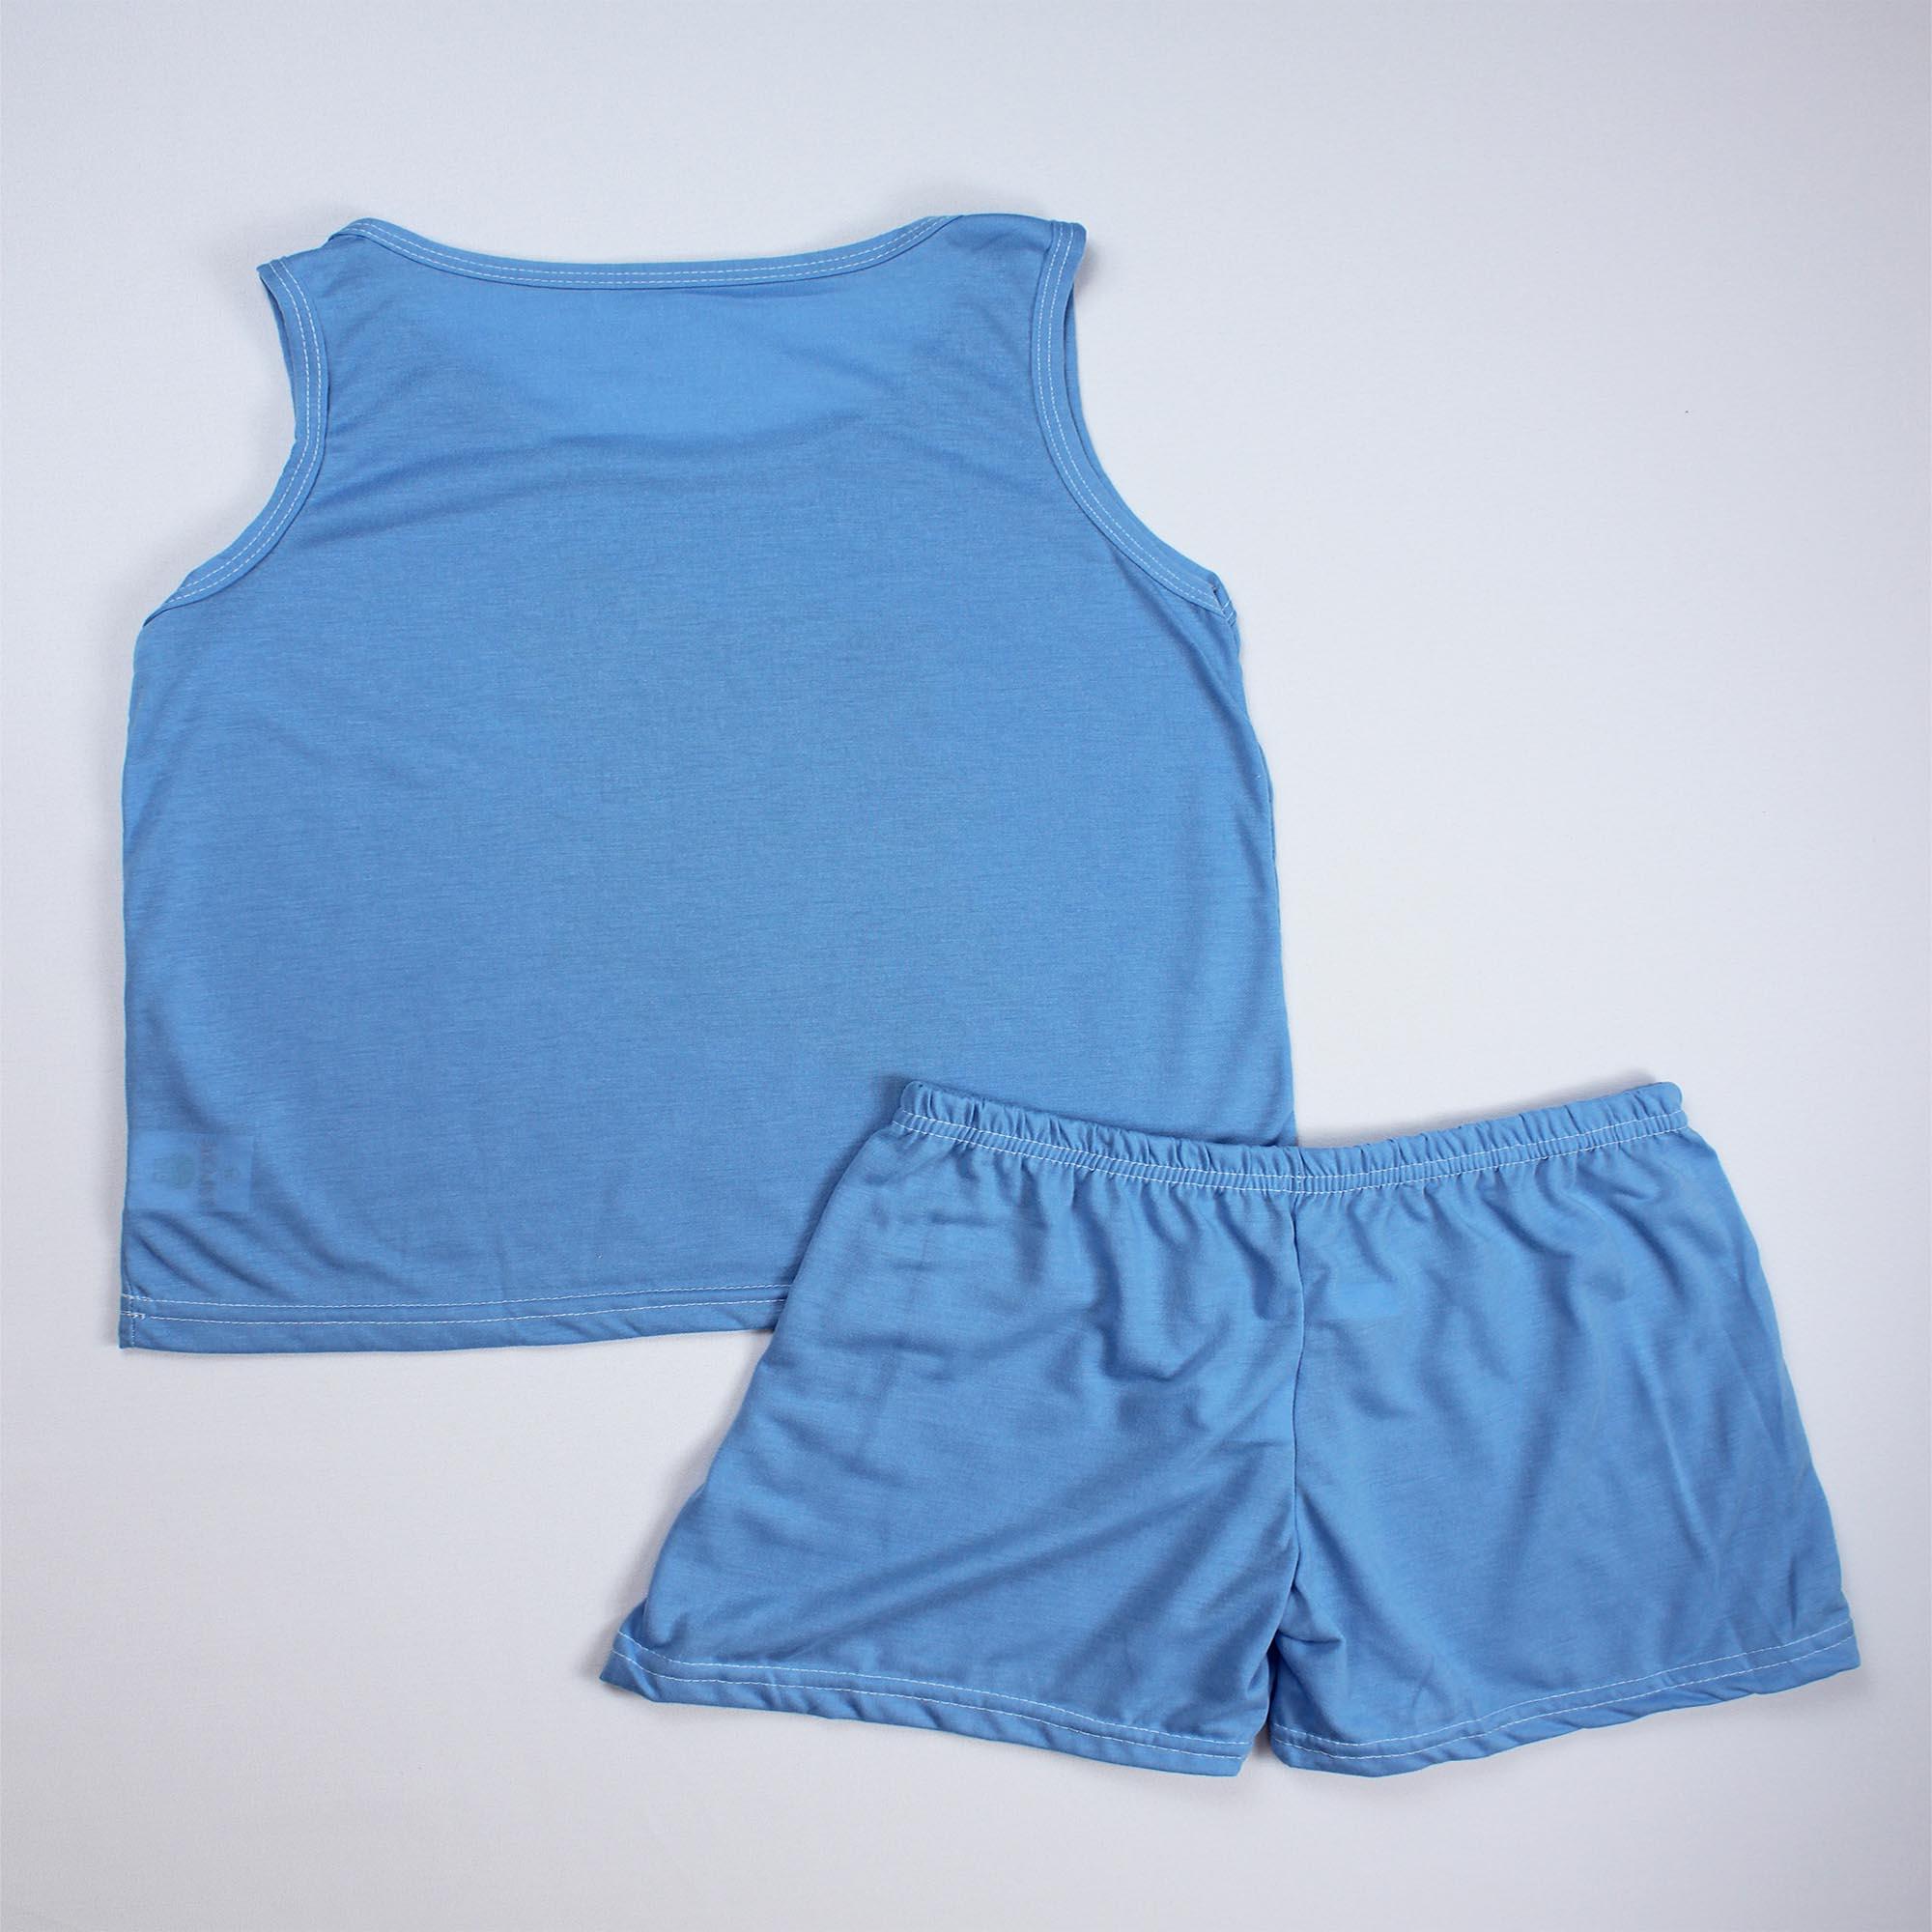 Pijama Regata Infantil Menino - Tamanho 12